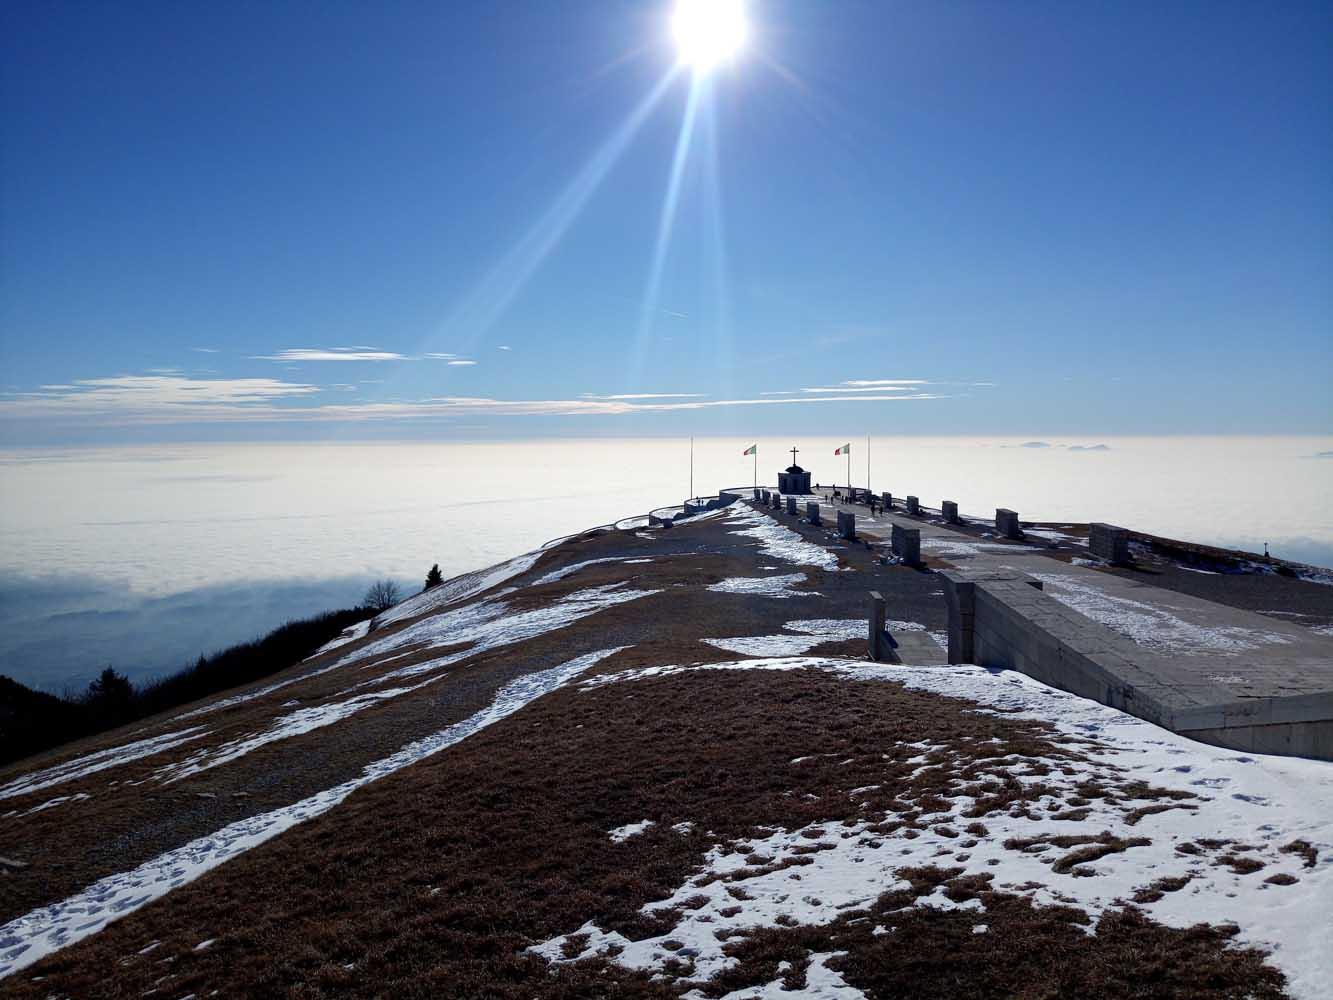 Monte-grappa-panorama